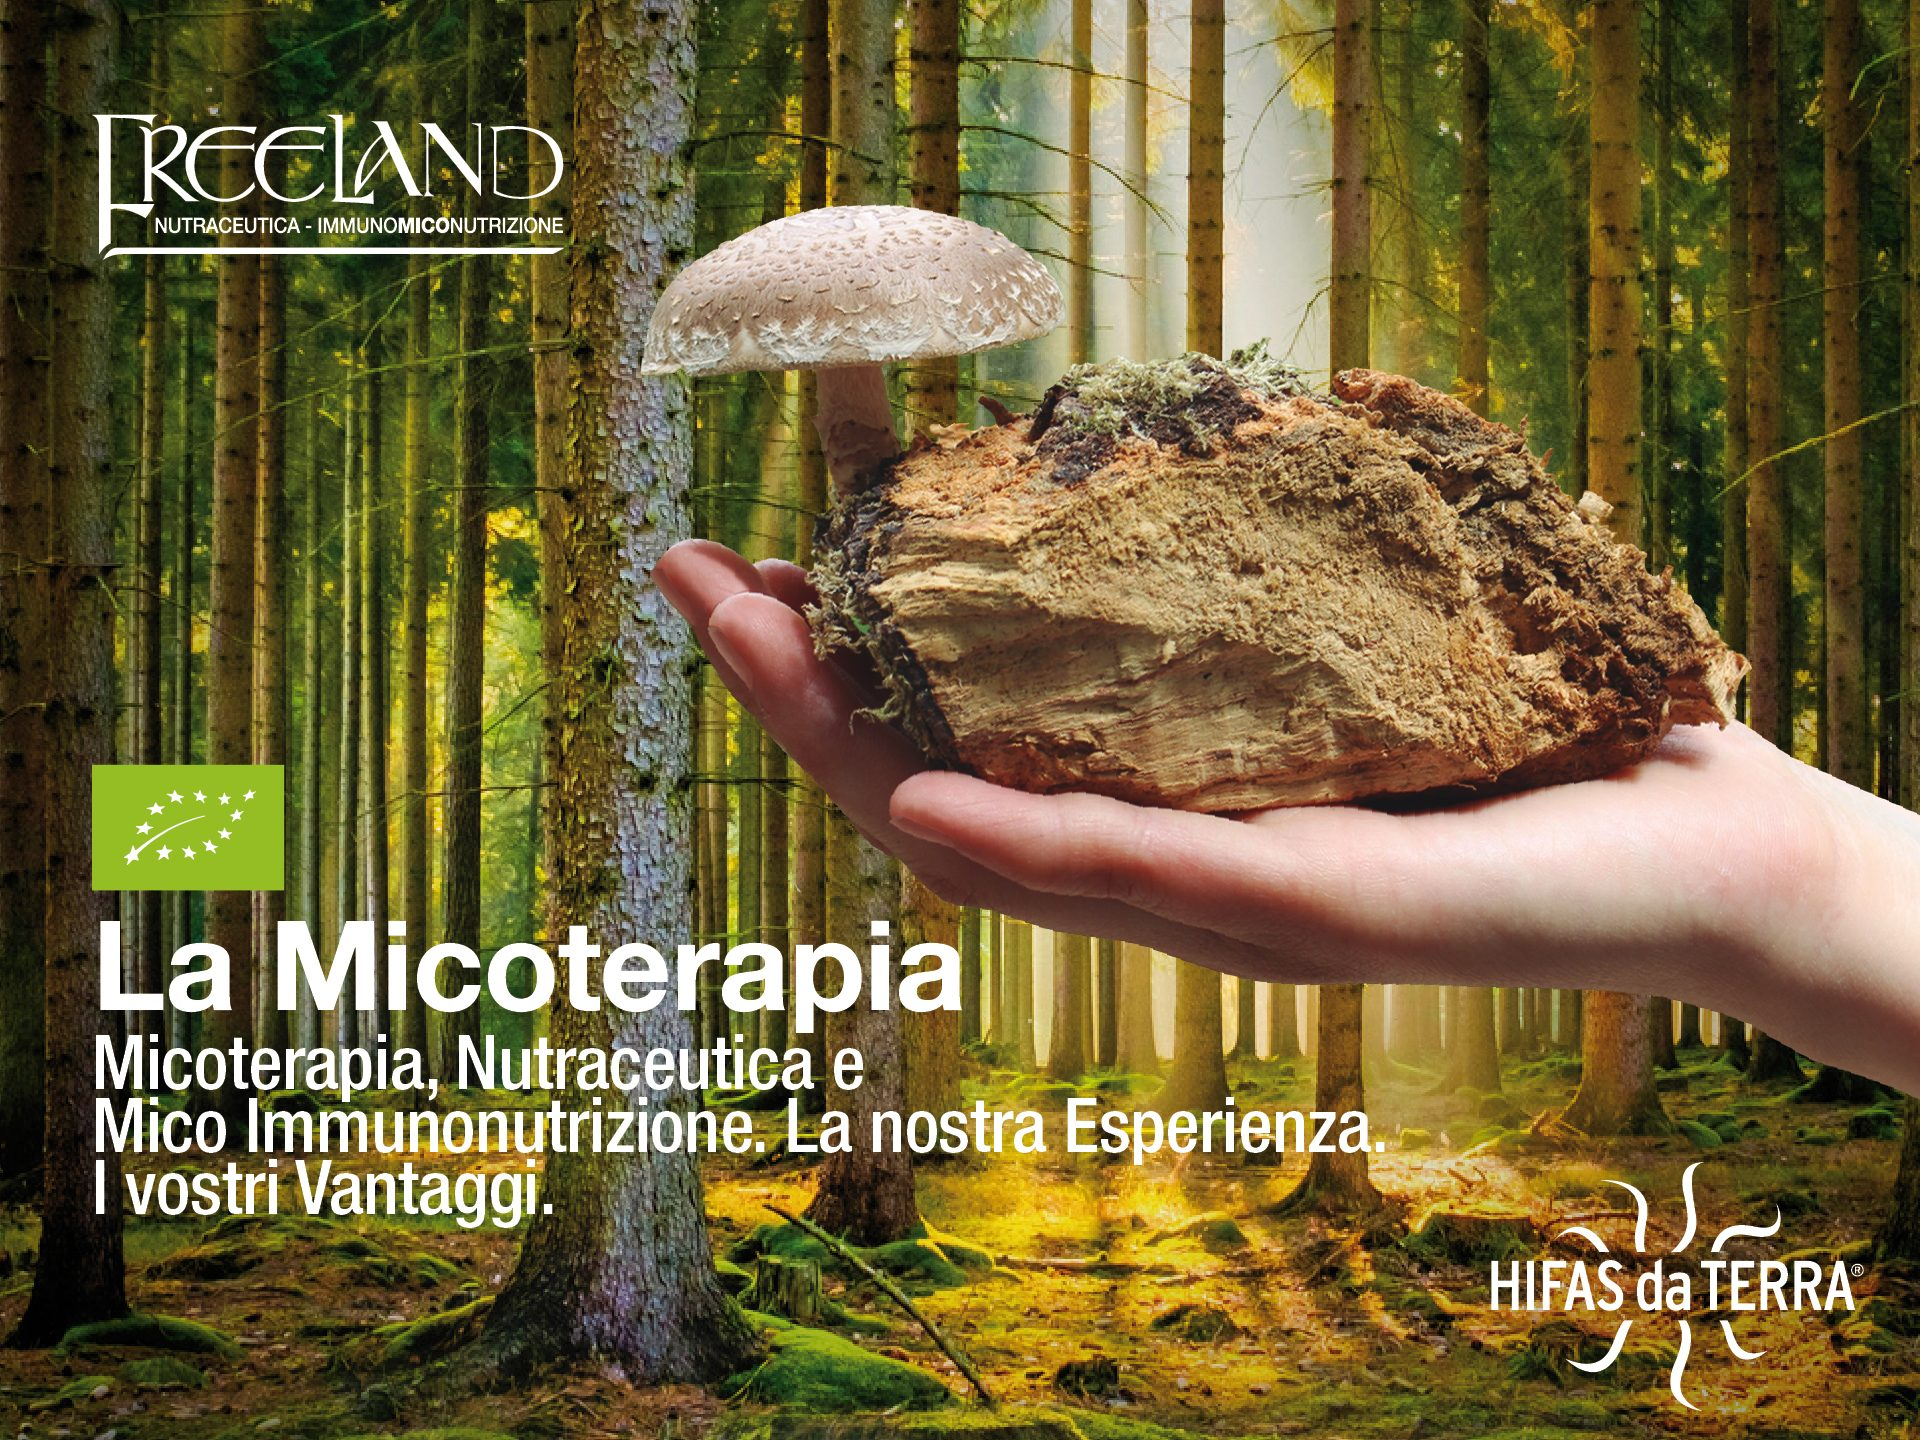 freeland-micoterapia